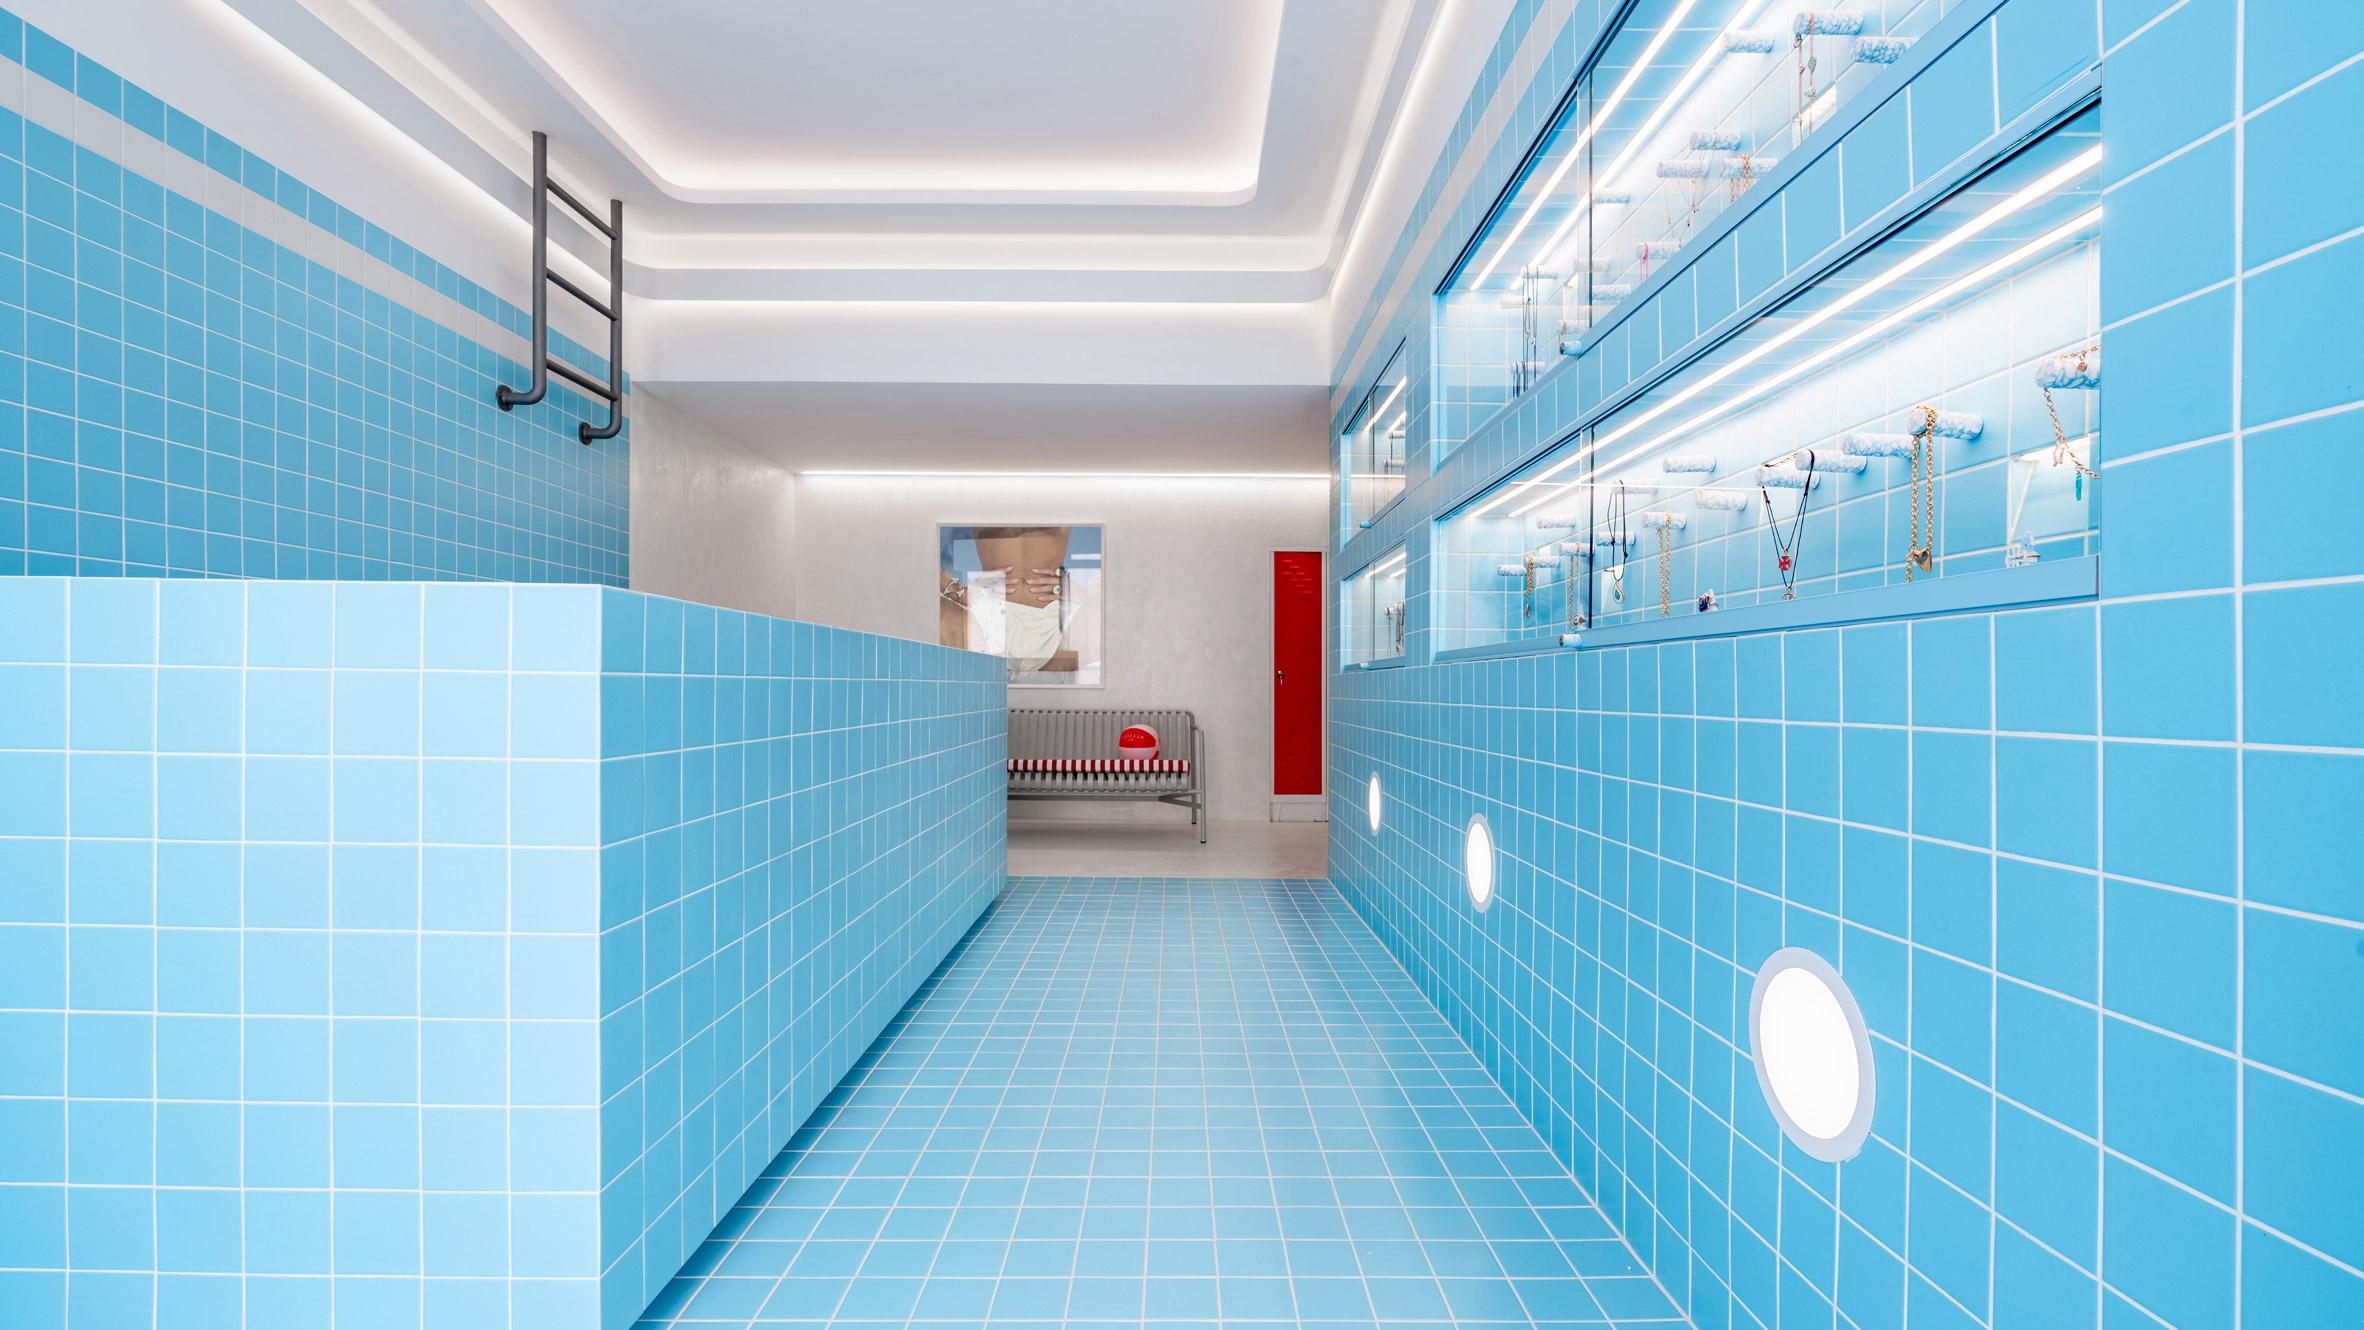 a blue tiled interior